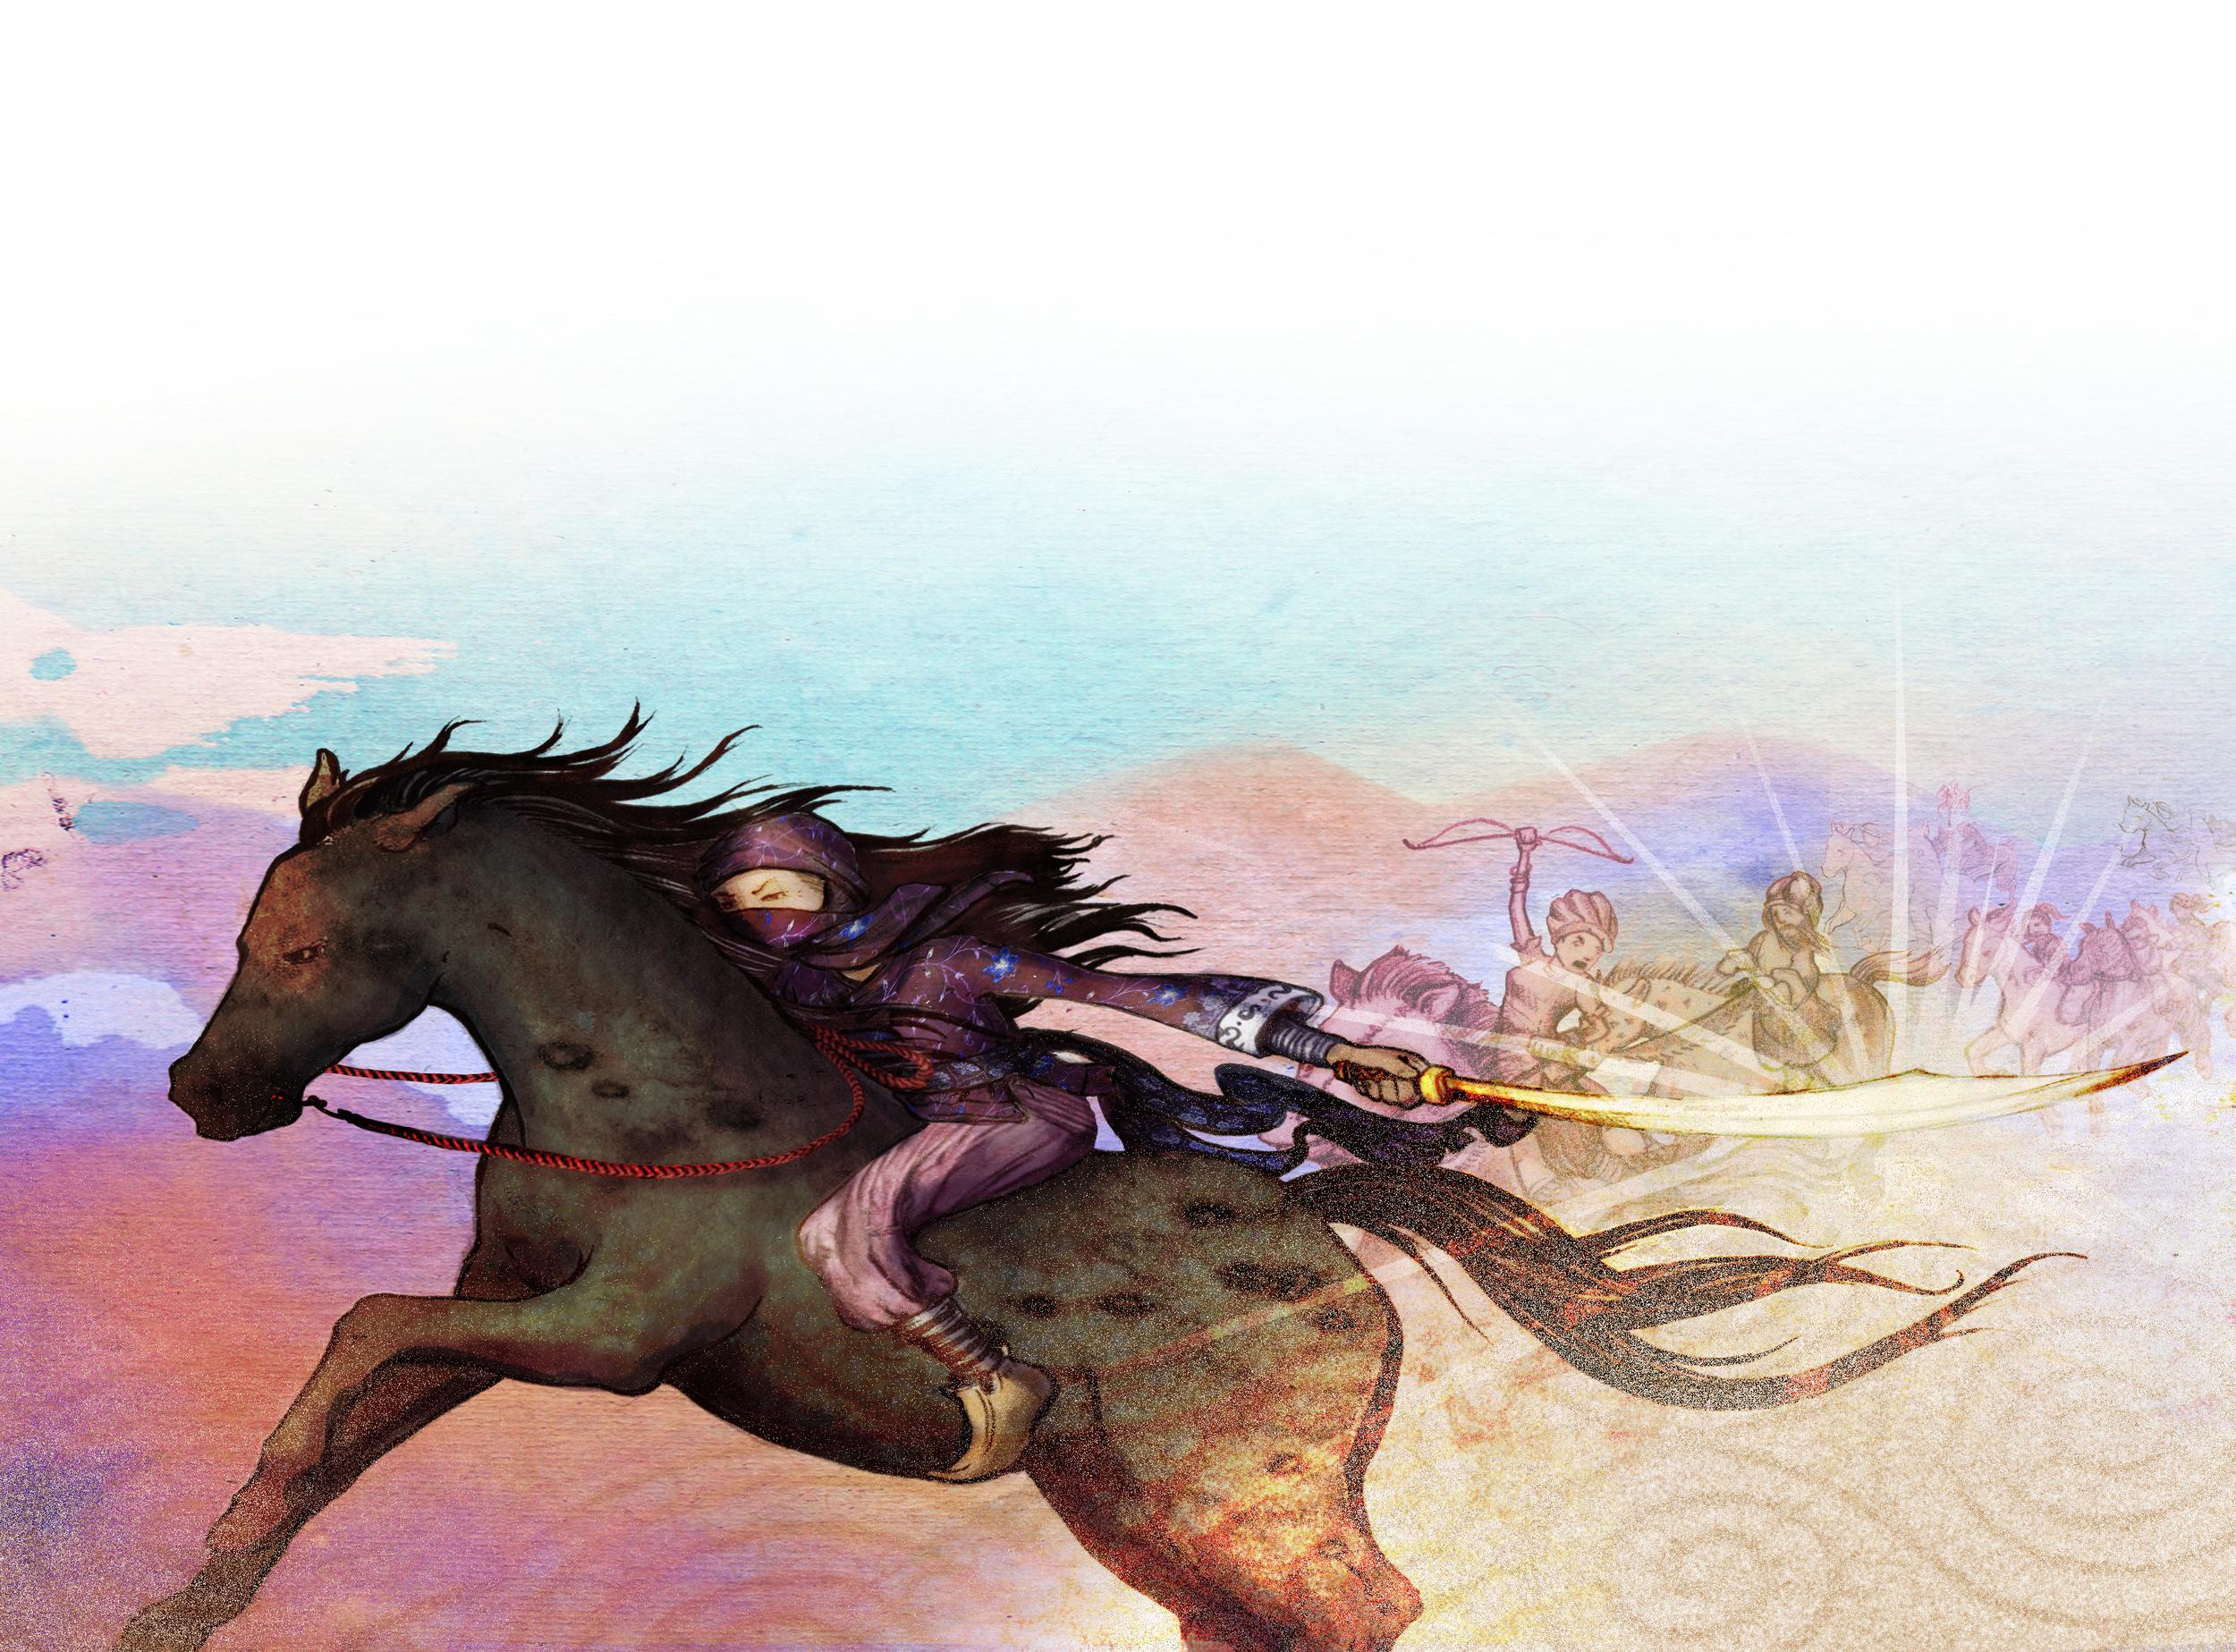 Rimonah's Great Escape